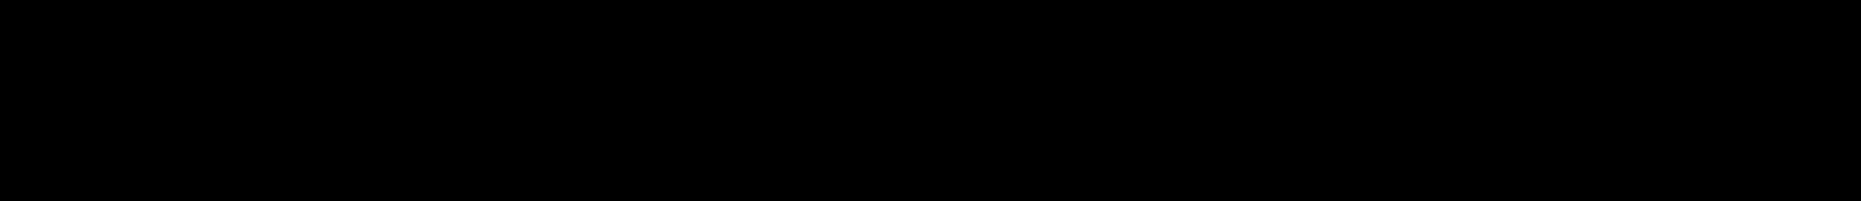 Sánchez Light Italic